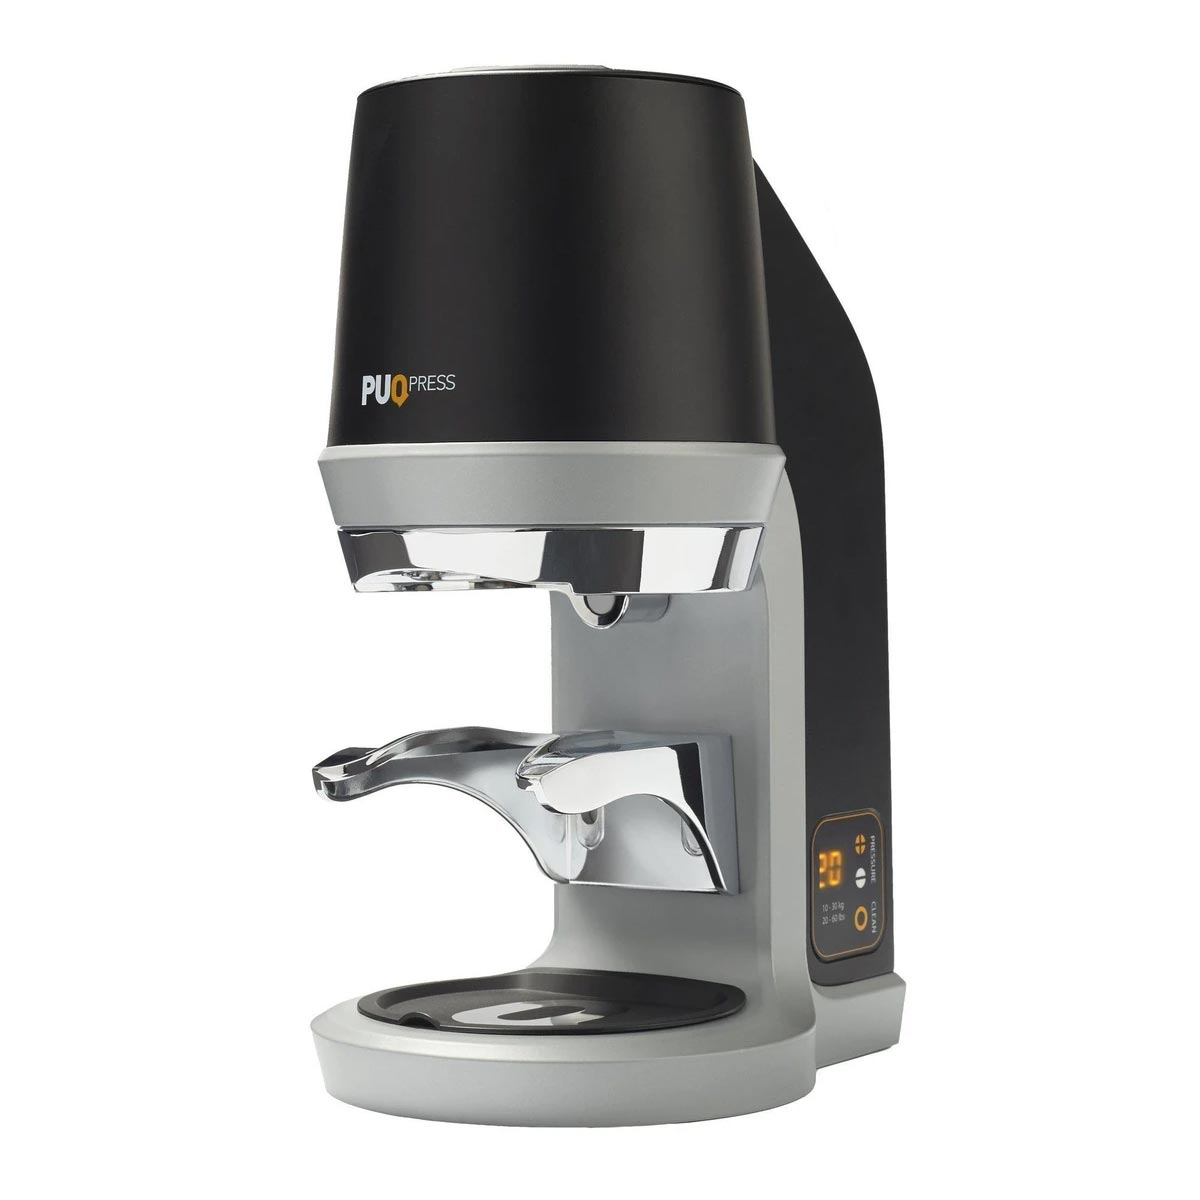 PuqPress Automatic Precision Coffee Tamper